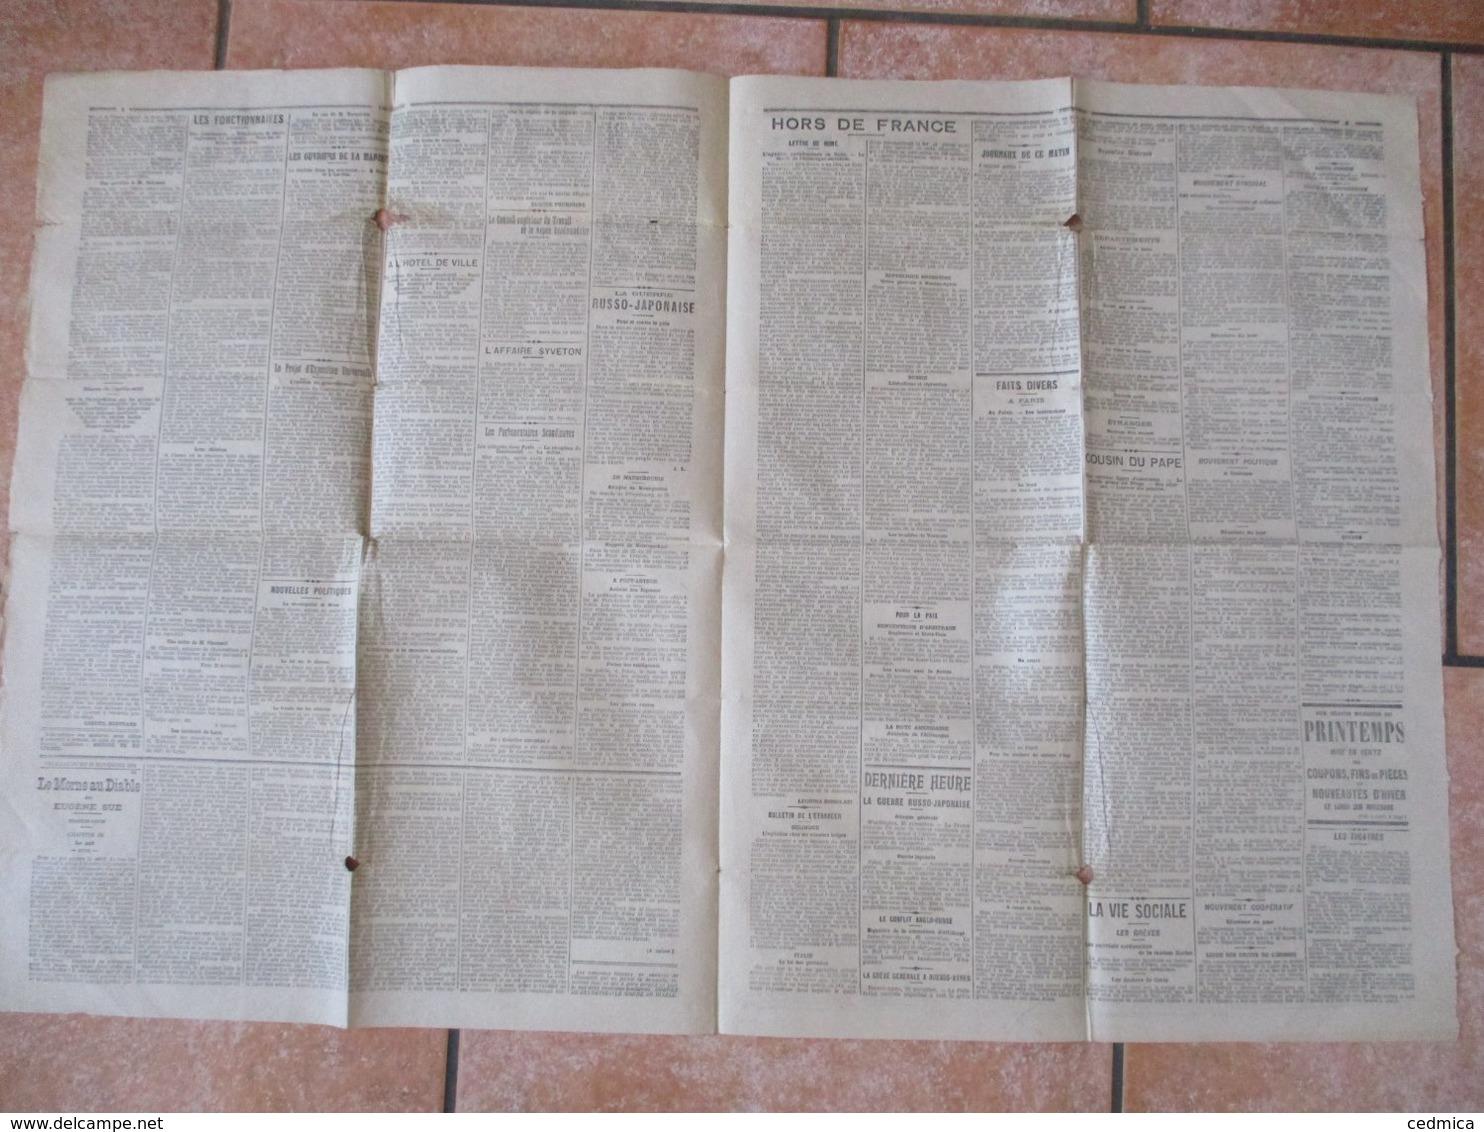 L'HUMANITE DU SAMEDI 26 NOVEMBRE 1904 DIRECTEUR POLITIQUE JEAN JAURES - Informations Générales